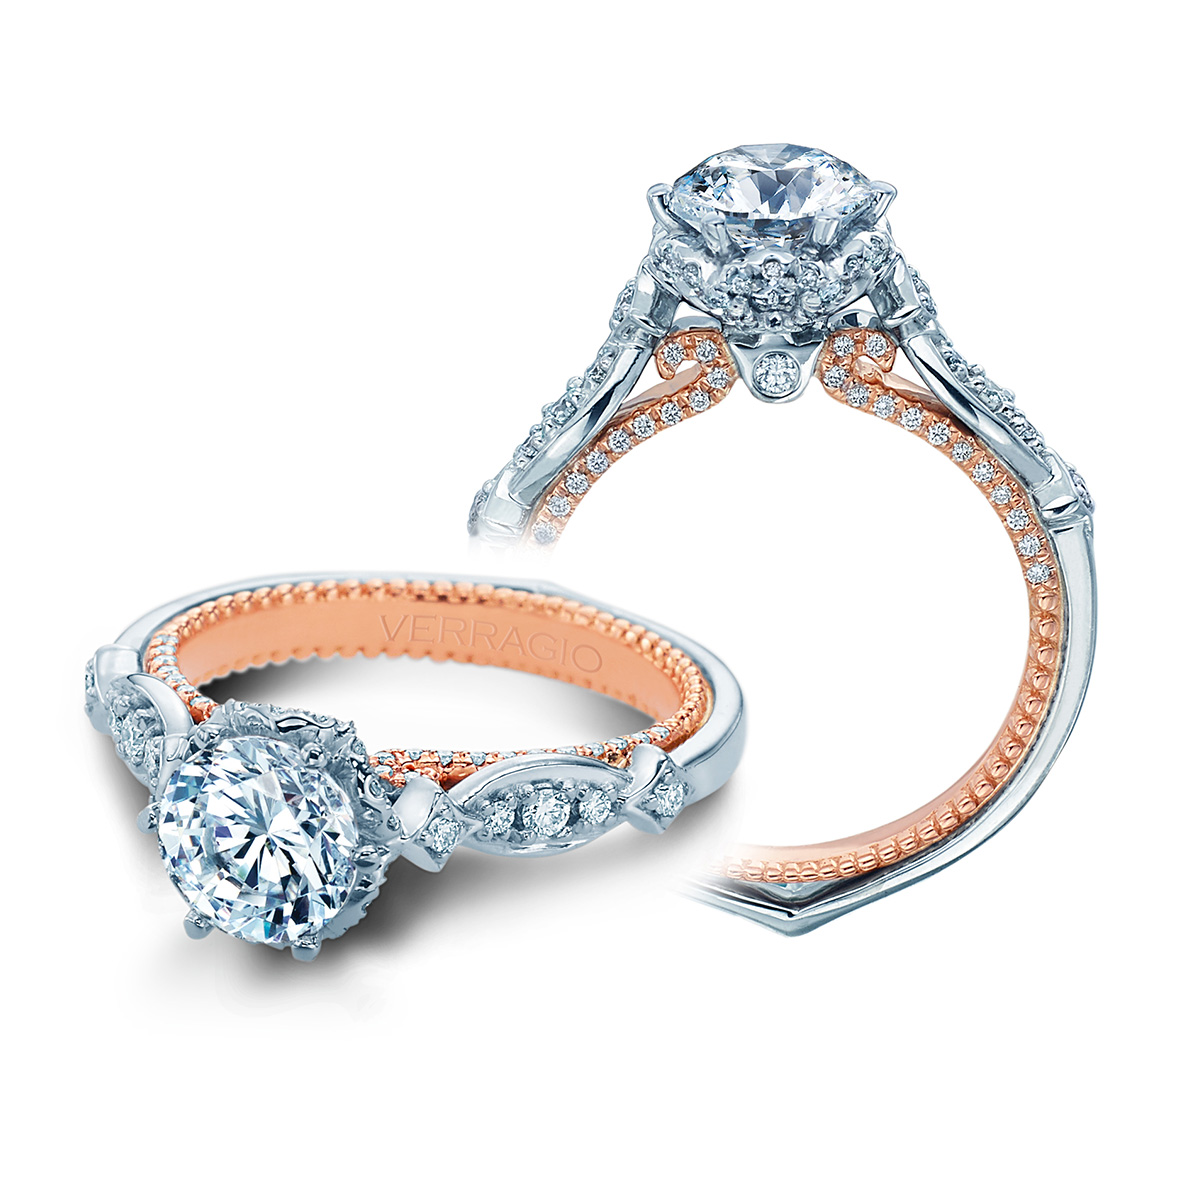 verragio couture 0443r 2wr 18 karat engagement ring tq